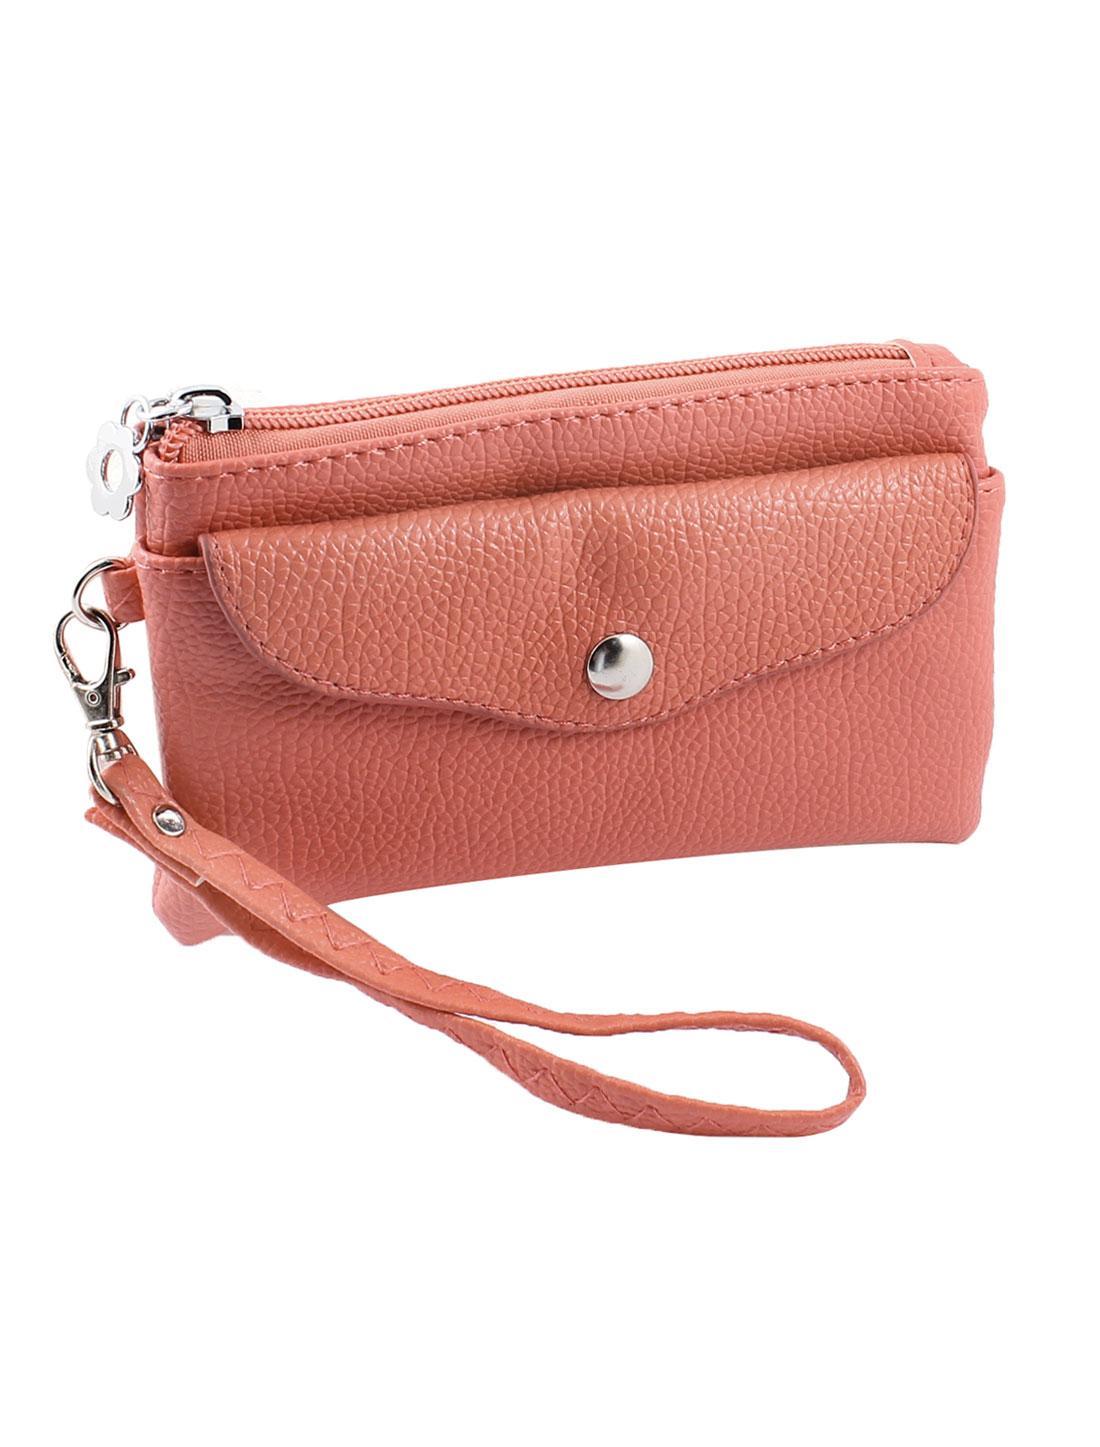 Watermelon Red Litchi Pattern Zipper Wallet Purse w Strap for Woman Lady